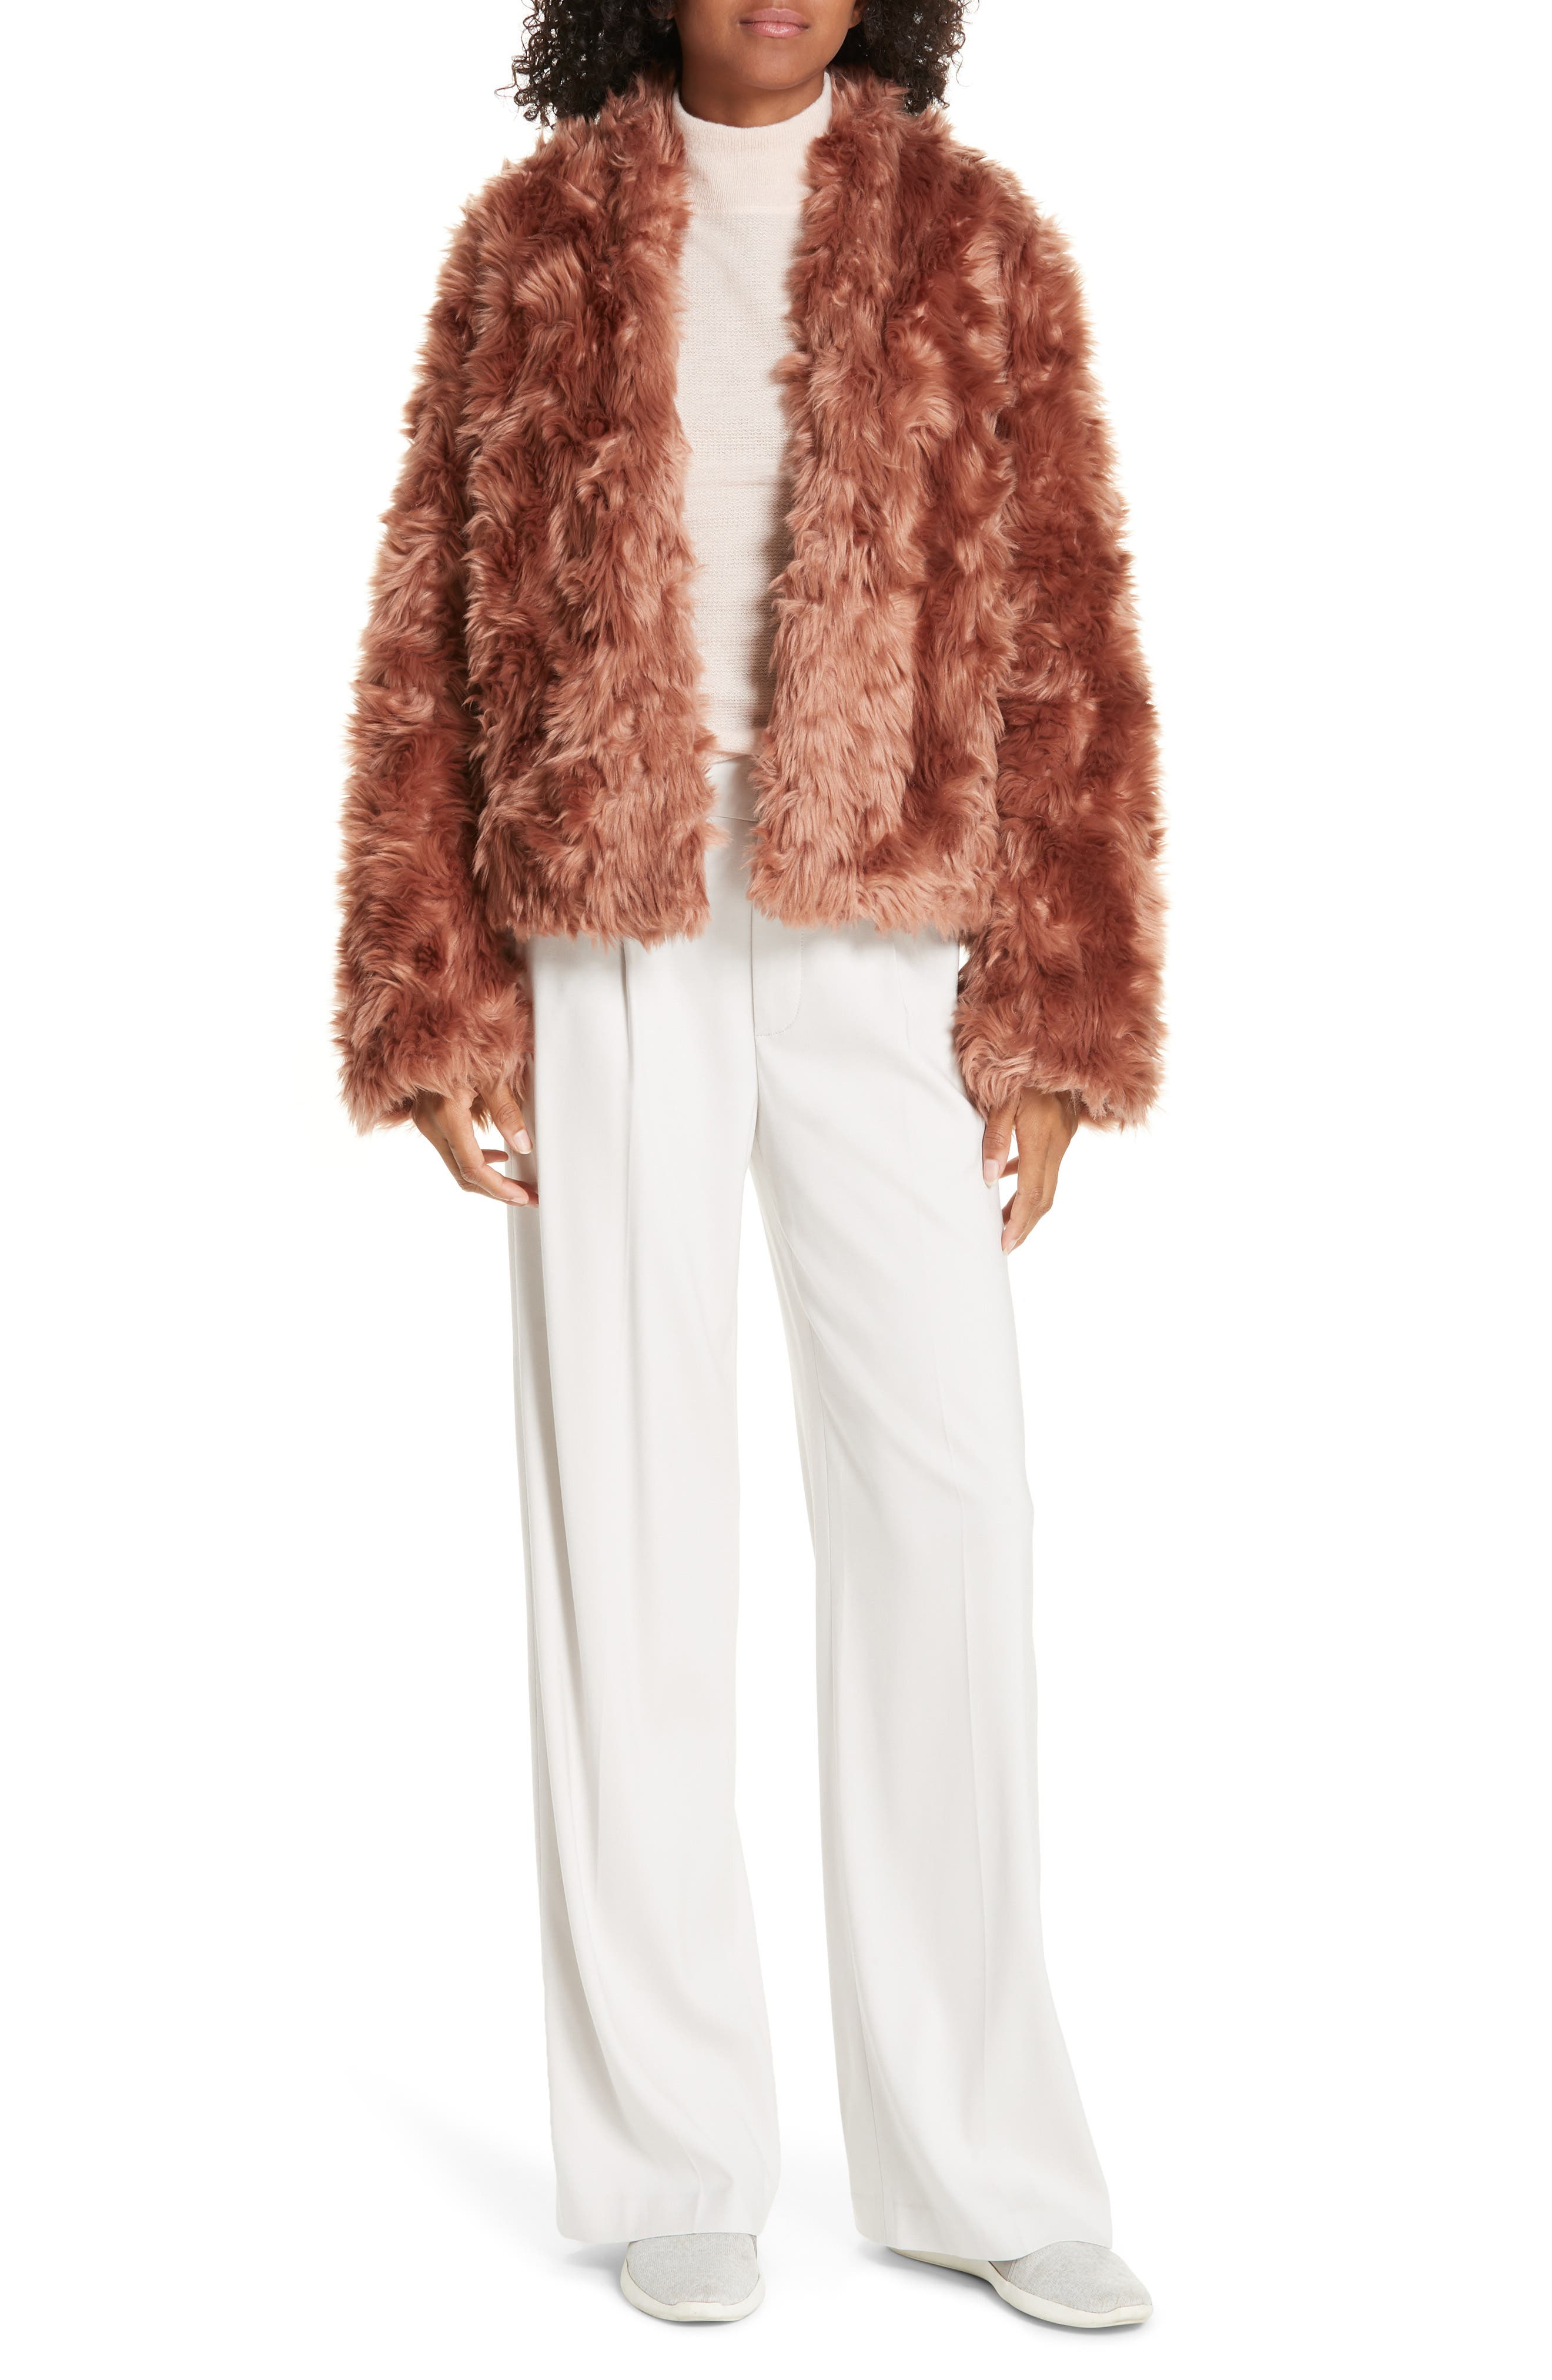 VINCE, Plush Faux Fur Jacket, Alternate thumbnail 8, color, PINK UMBER